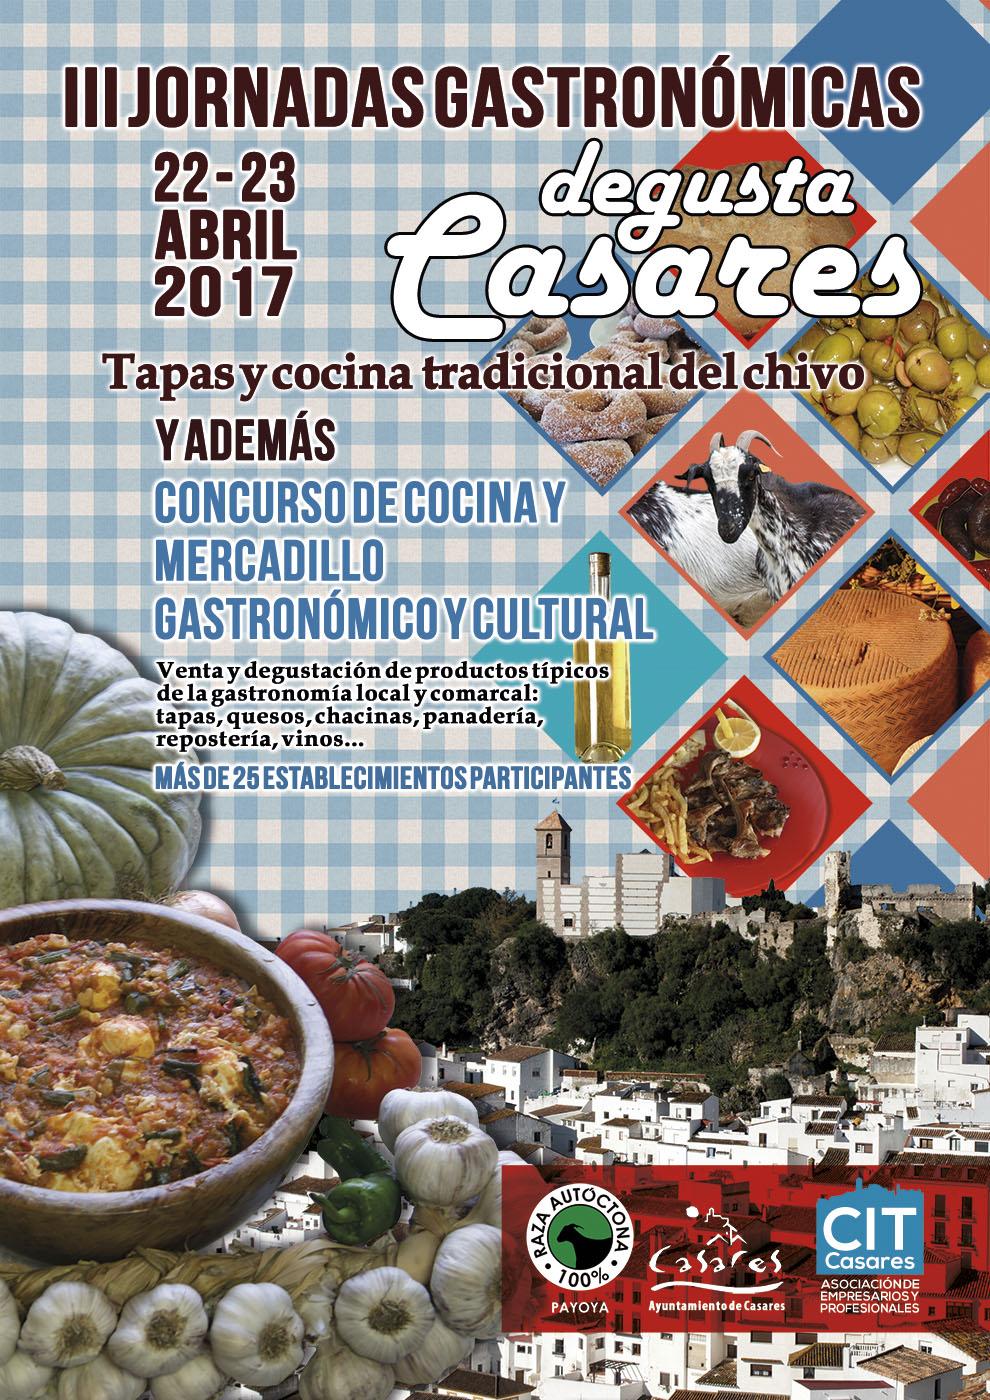 III Jornadas gastronómicas Degusta Casares